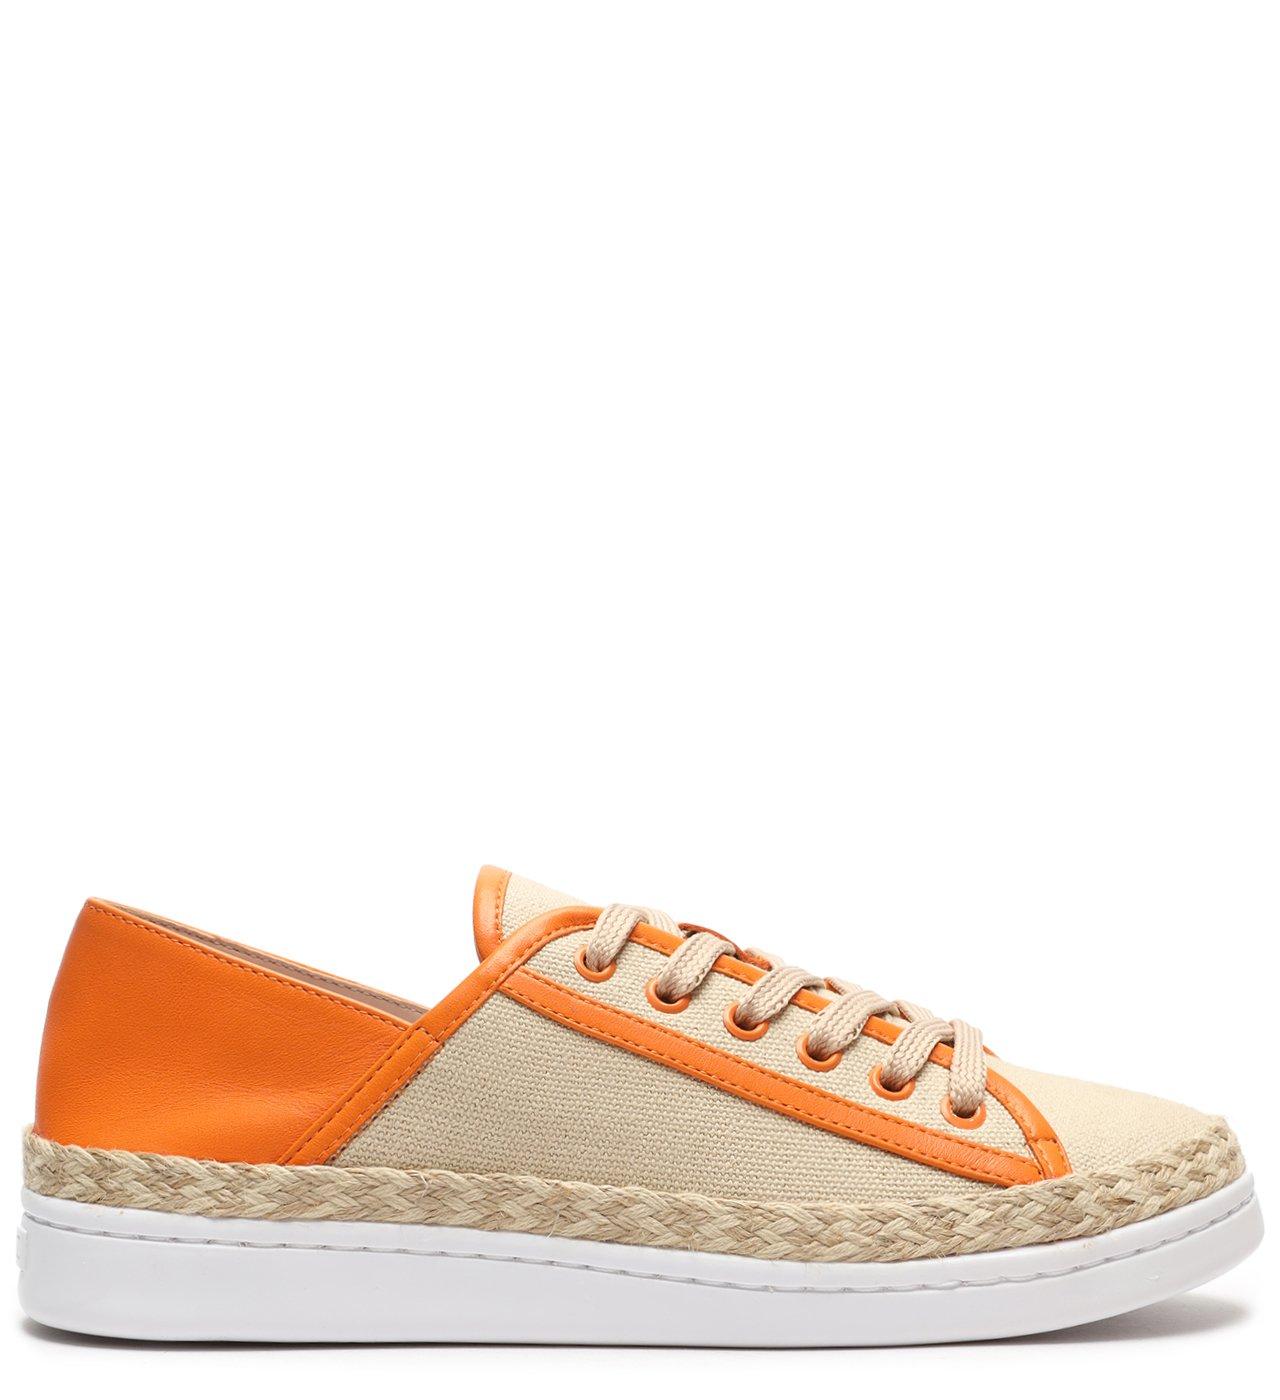 Sneaker Ultralight Natural Tangerine | Schutz